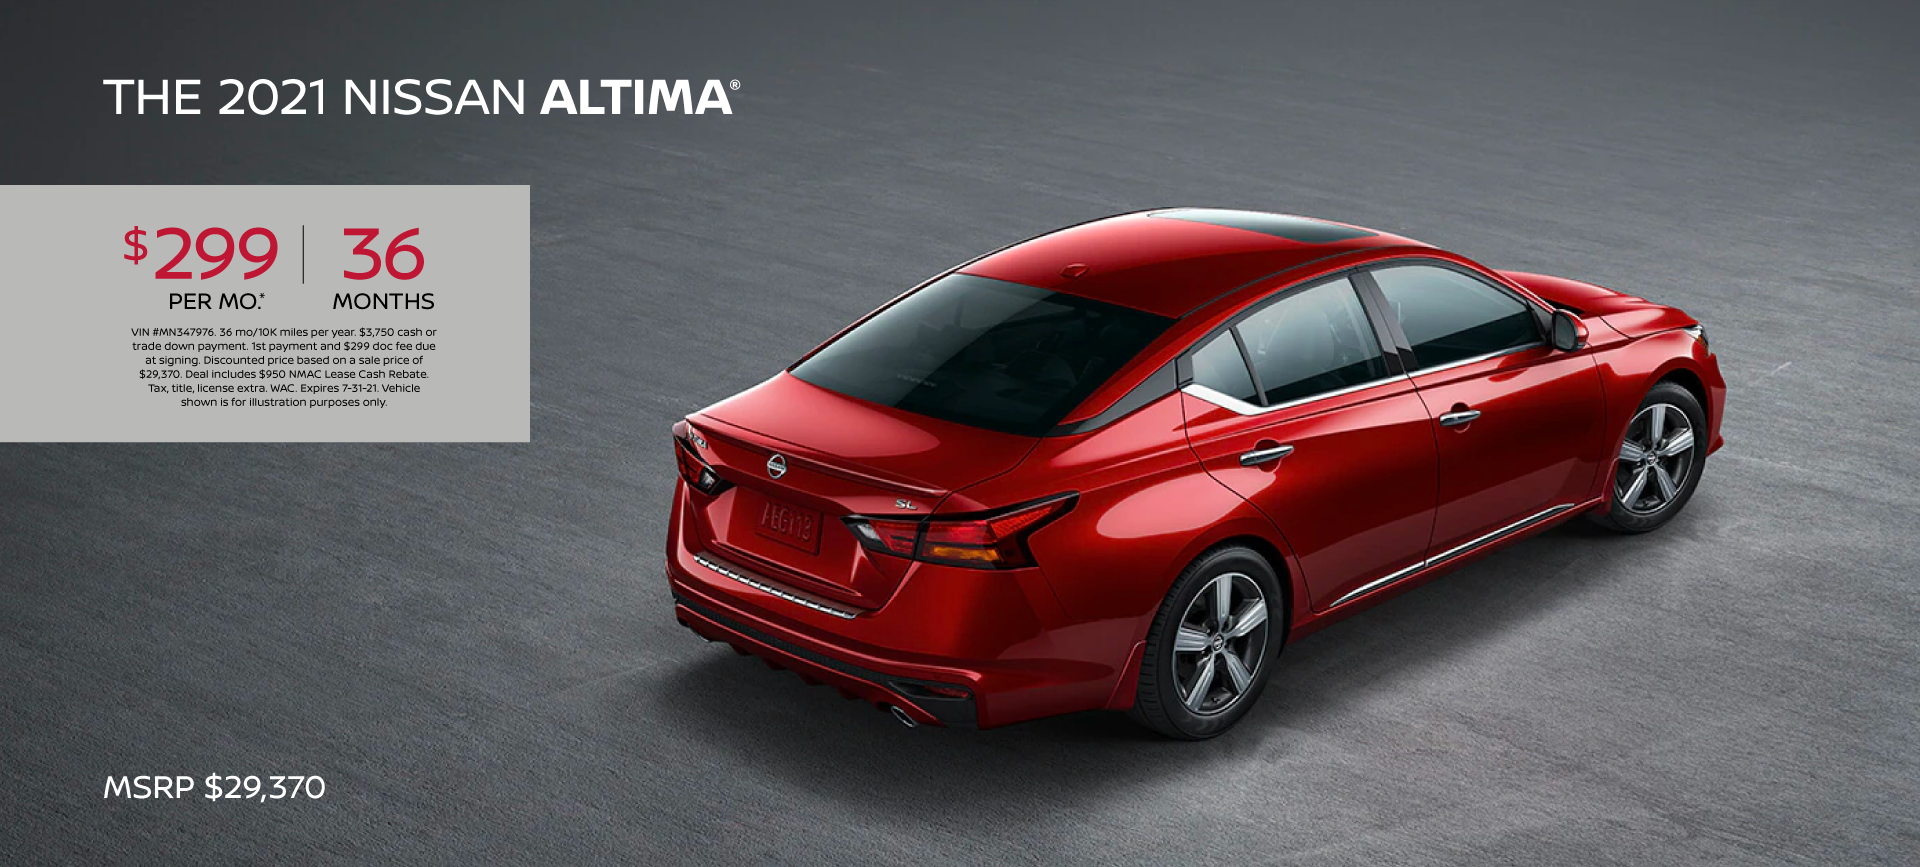 Nissan-Place-OEM-0721_Altima